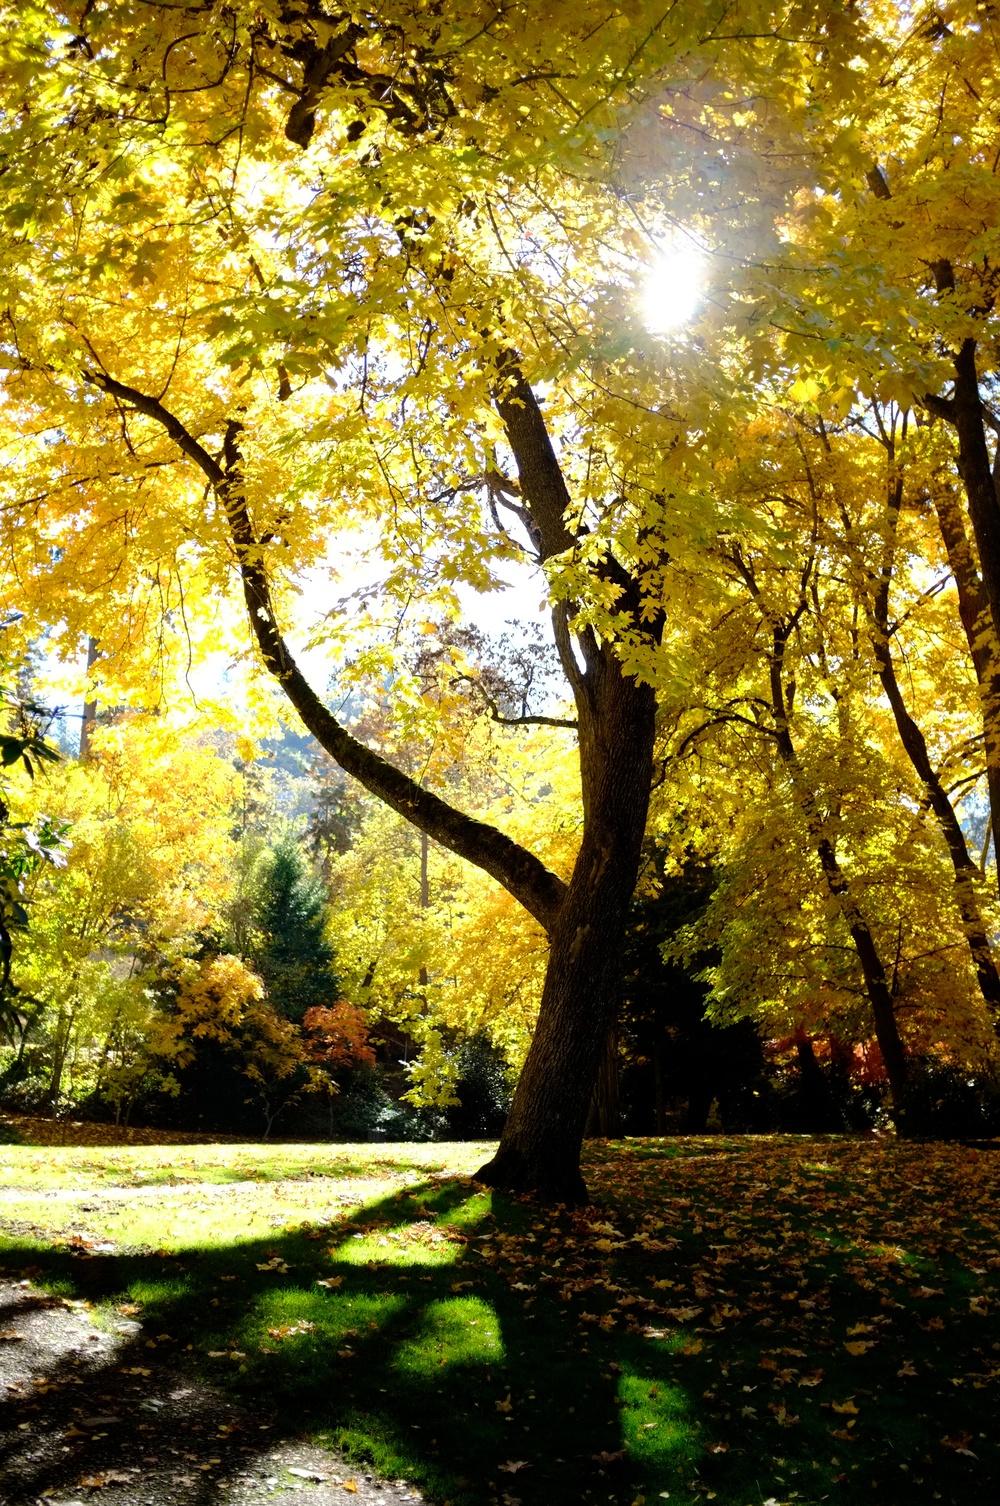 Rebecca_2012-11-04_11-44-55__DSF1565_©JosephLinaschke2012.jpg